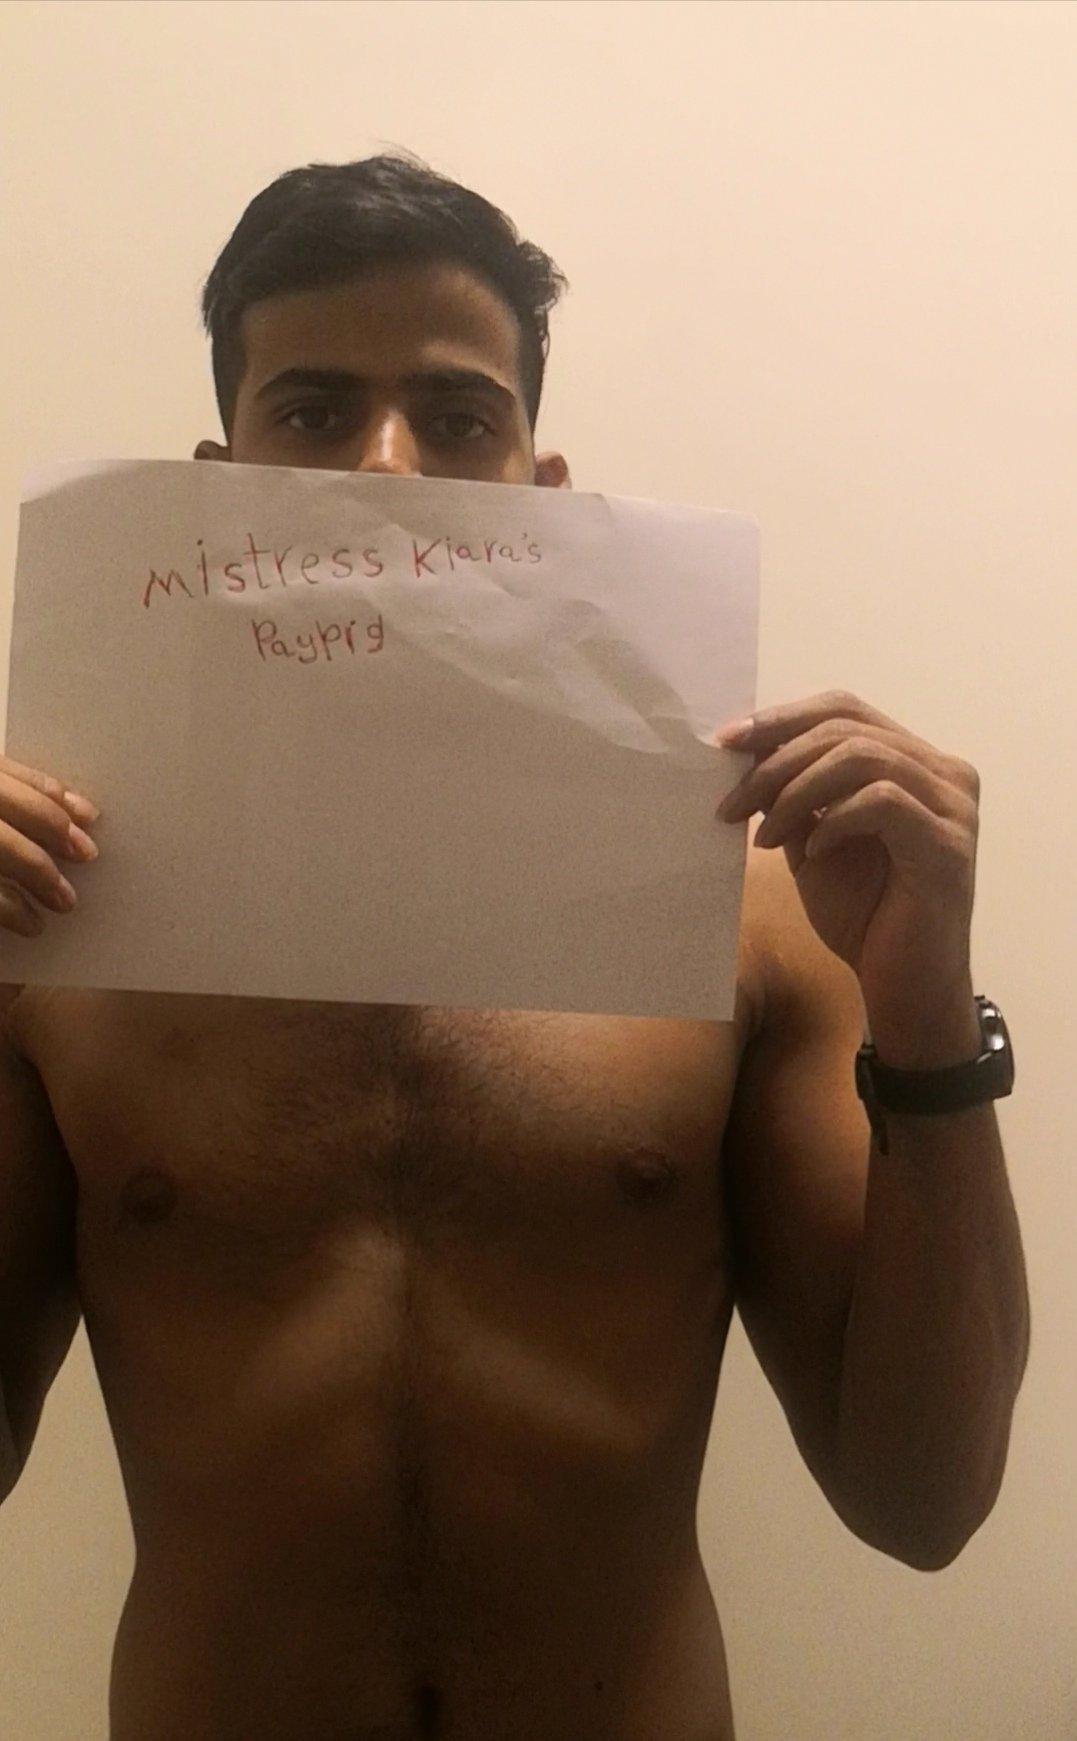 real blackmail exposure sub for femdom Mistress DominaKiara